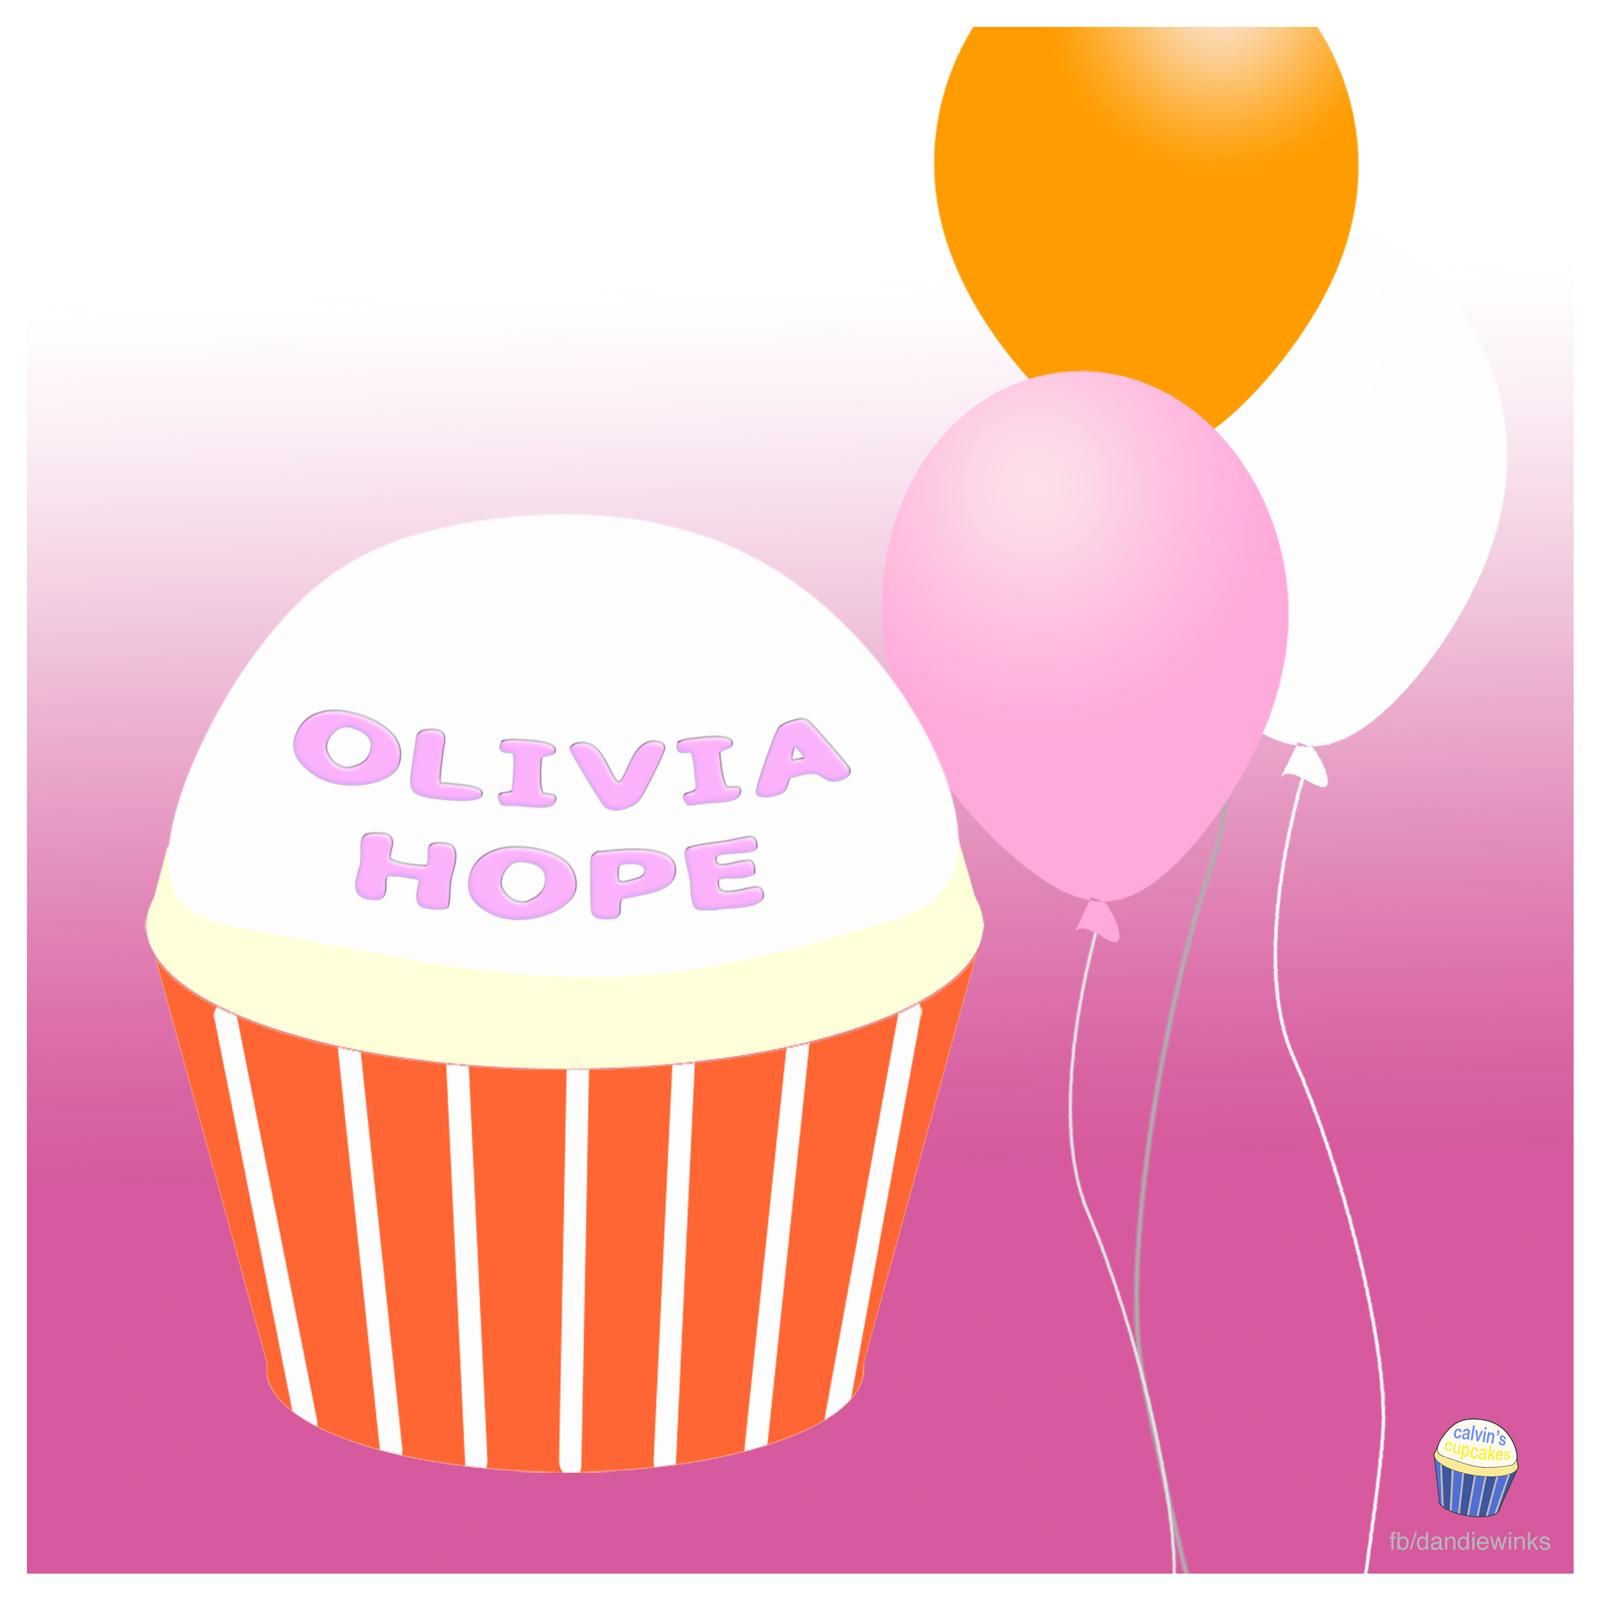 Olivia Hope's 1st birthday remembrance cupcake.